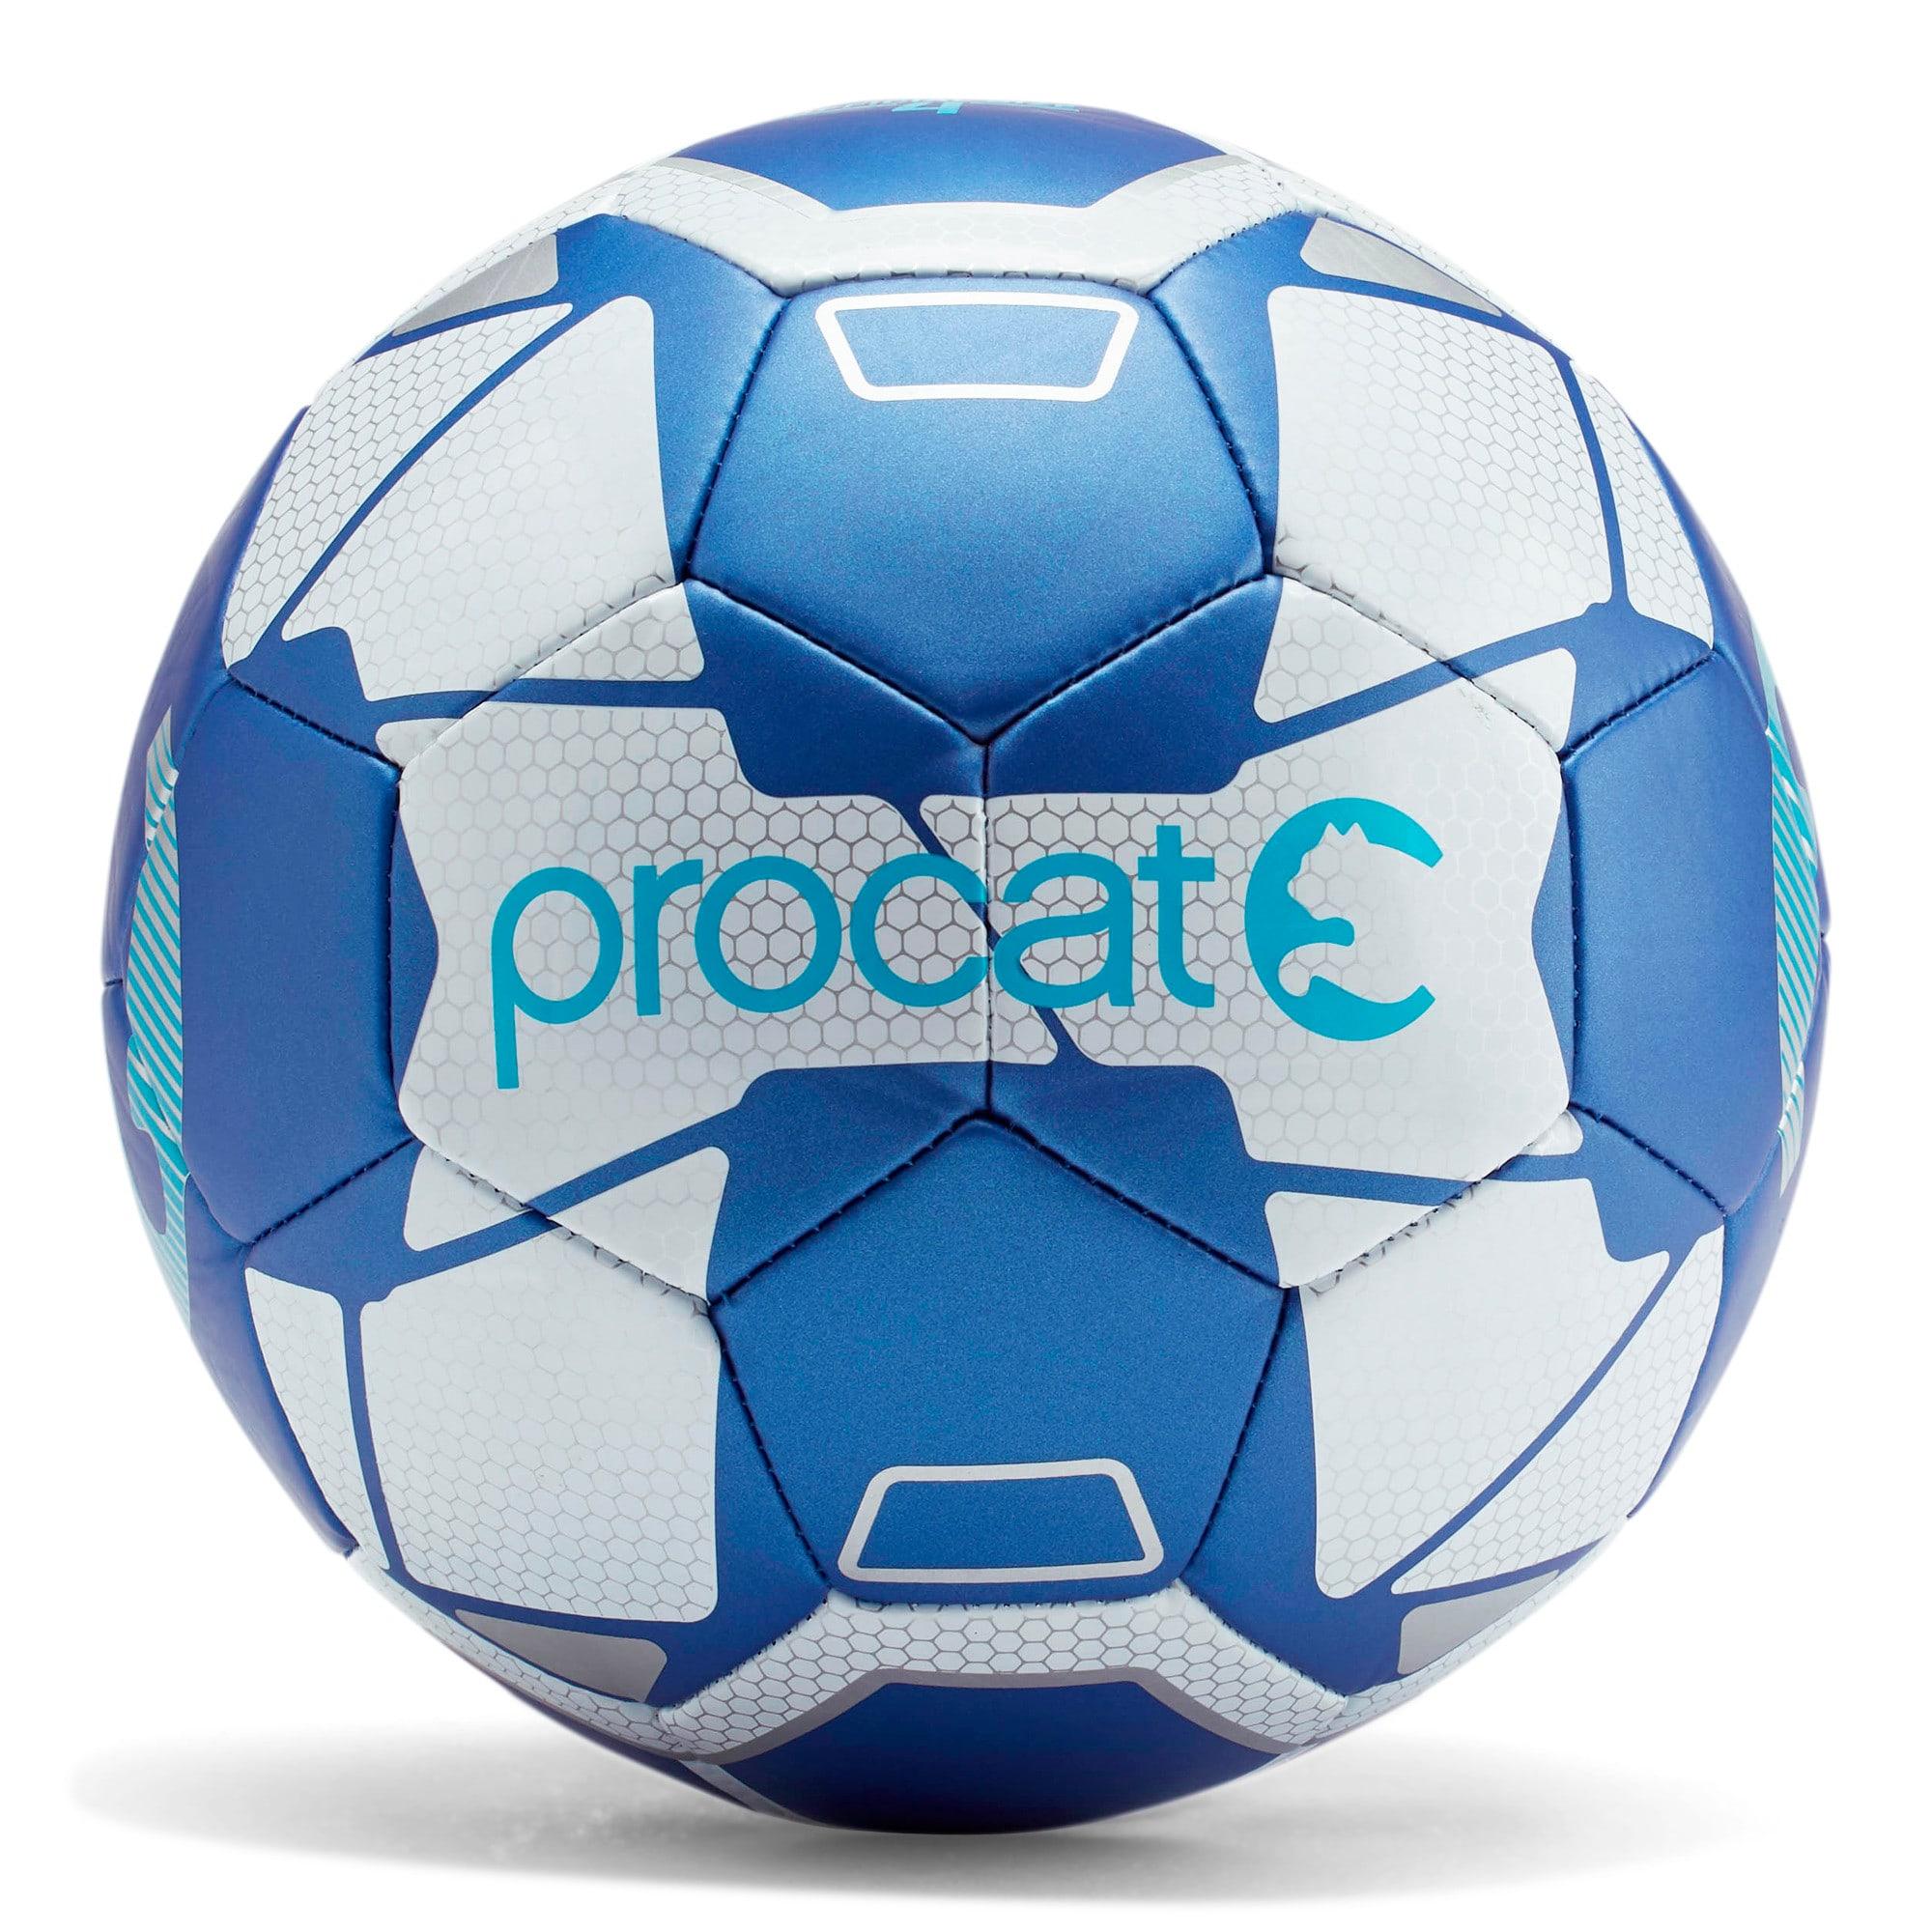 Thumbnail 1 of ProCat Fractal Soccer Ball, BLUE, medium